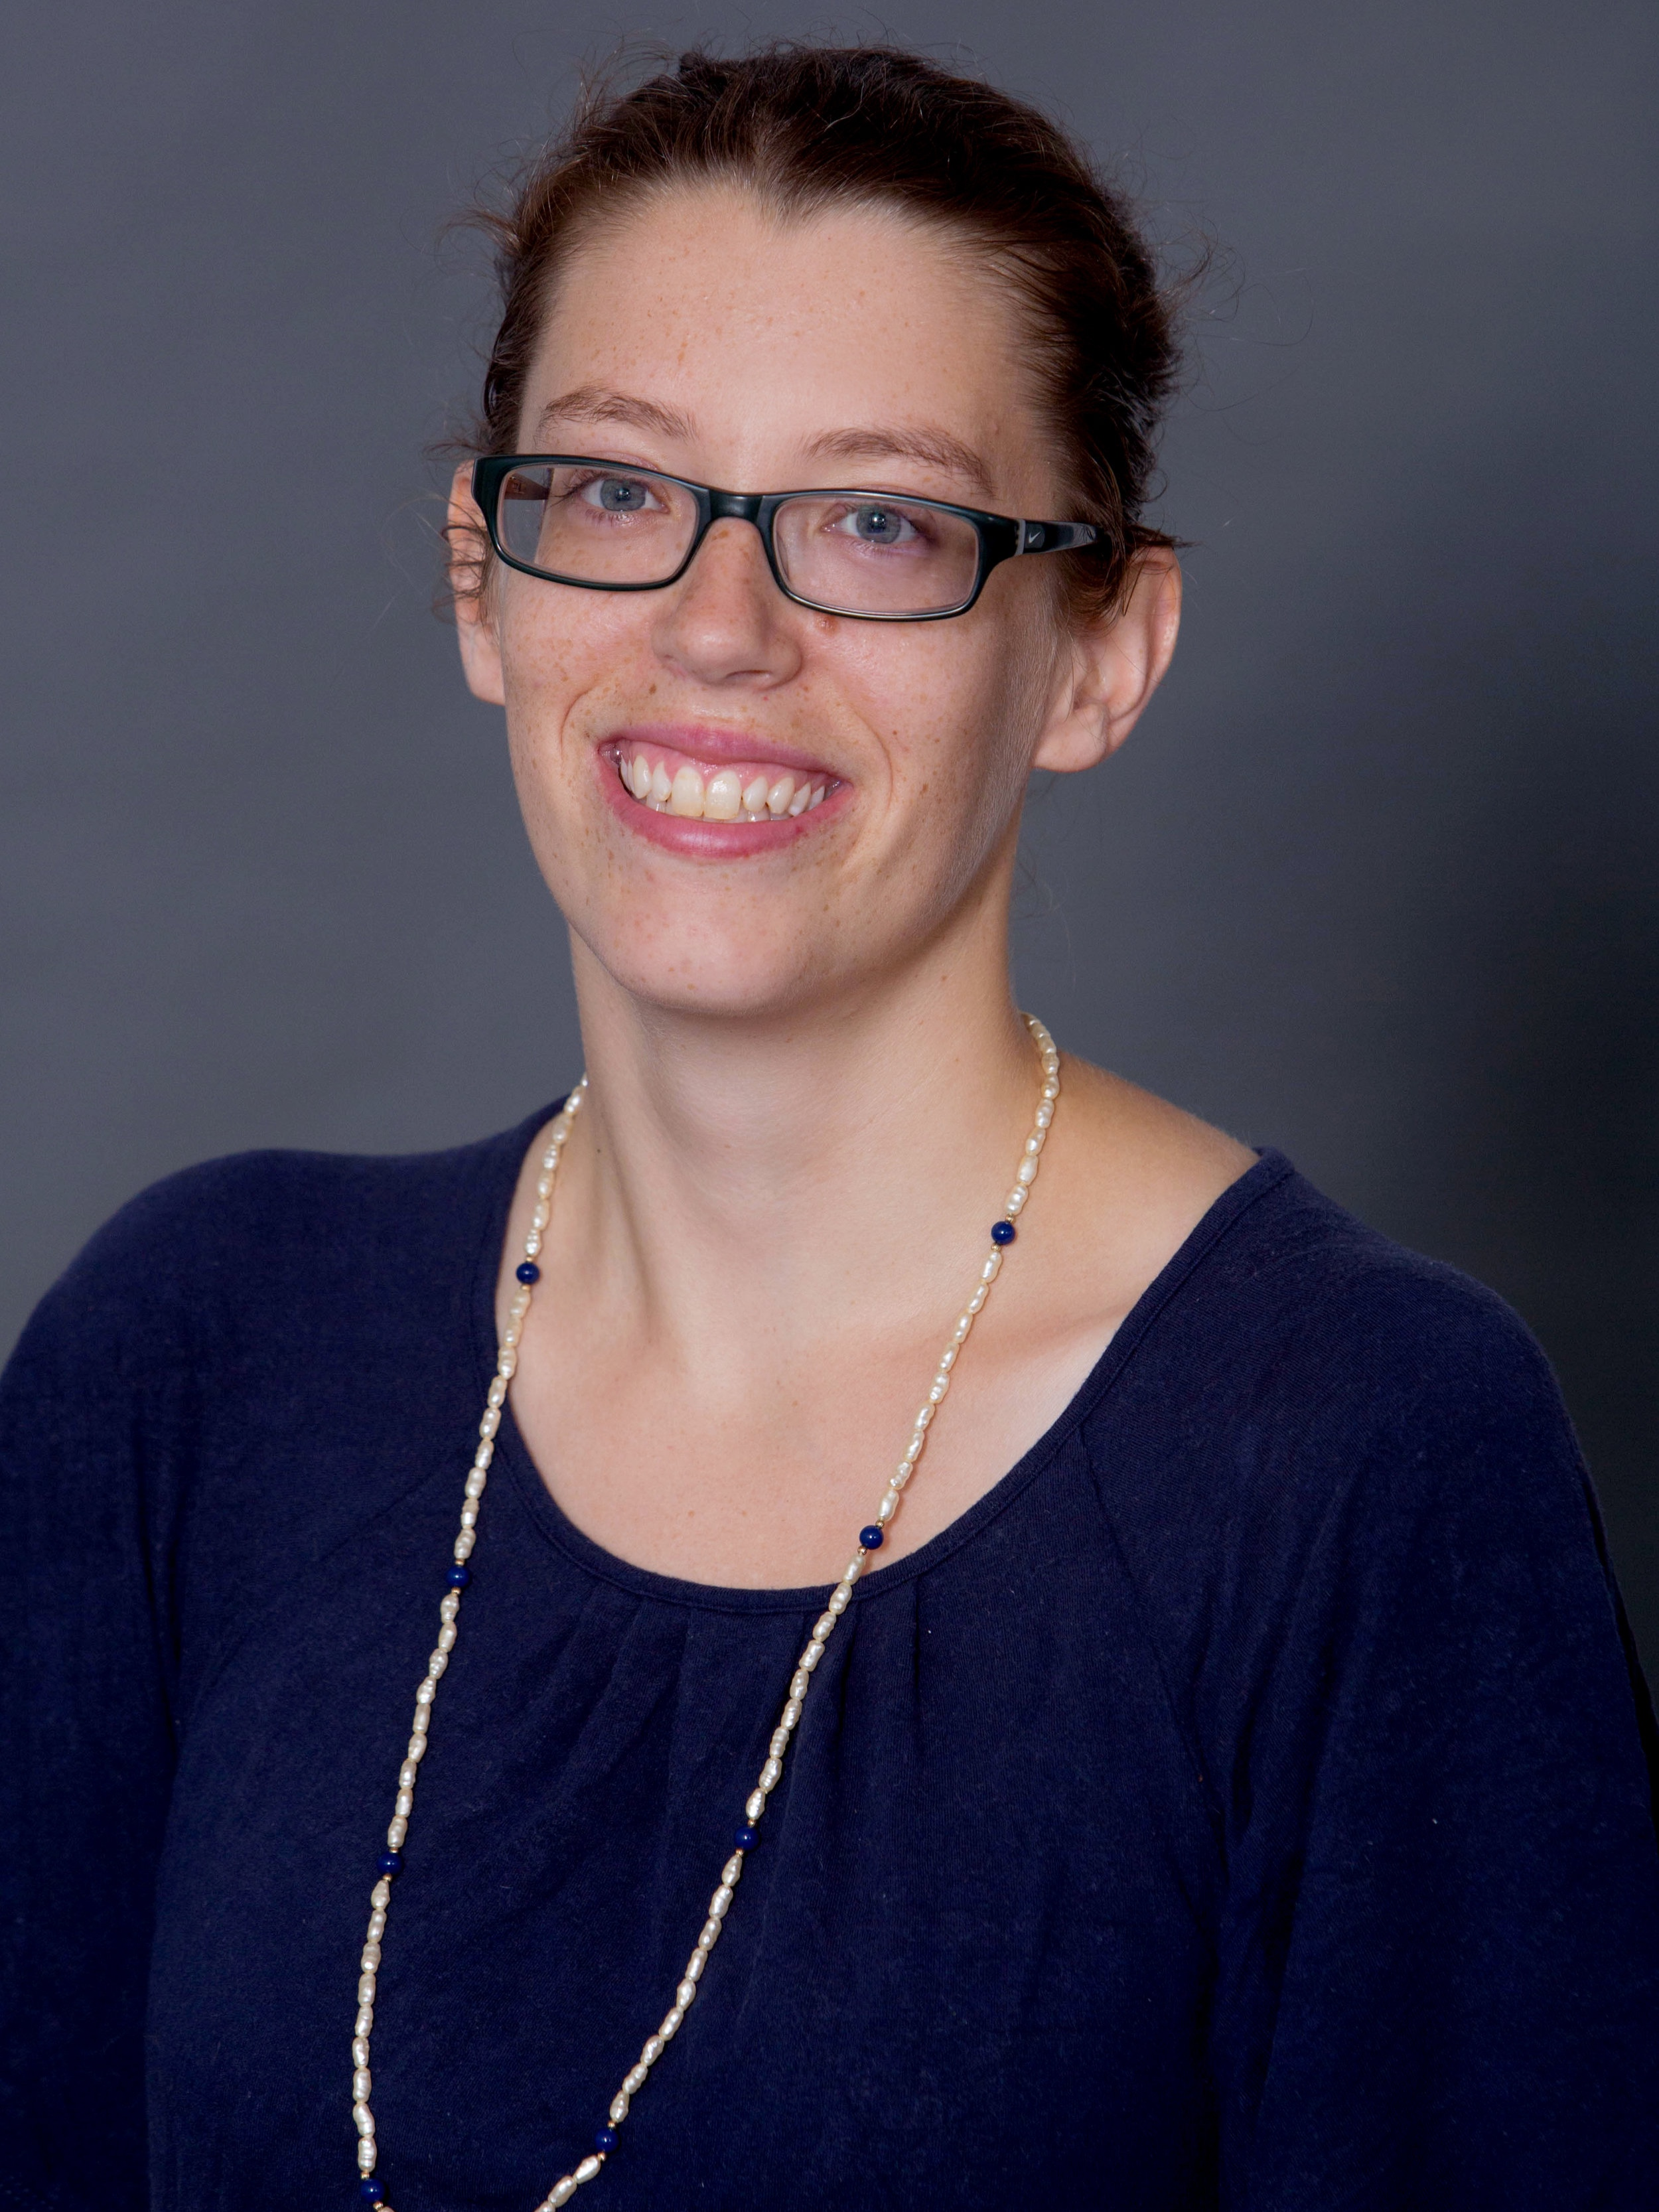 Rachel A. Horowitz, Appalachian State University